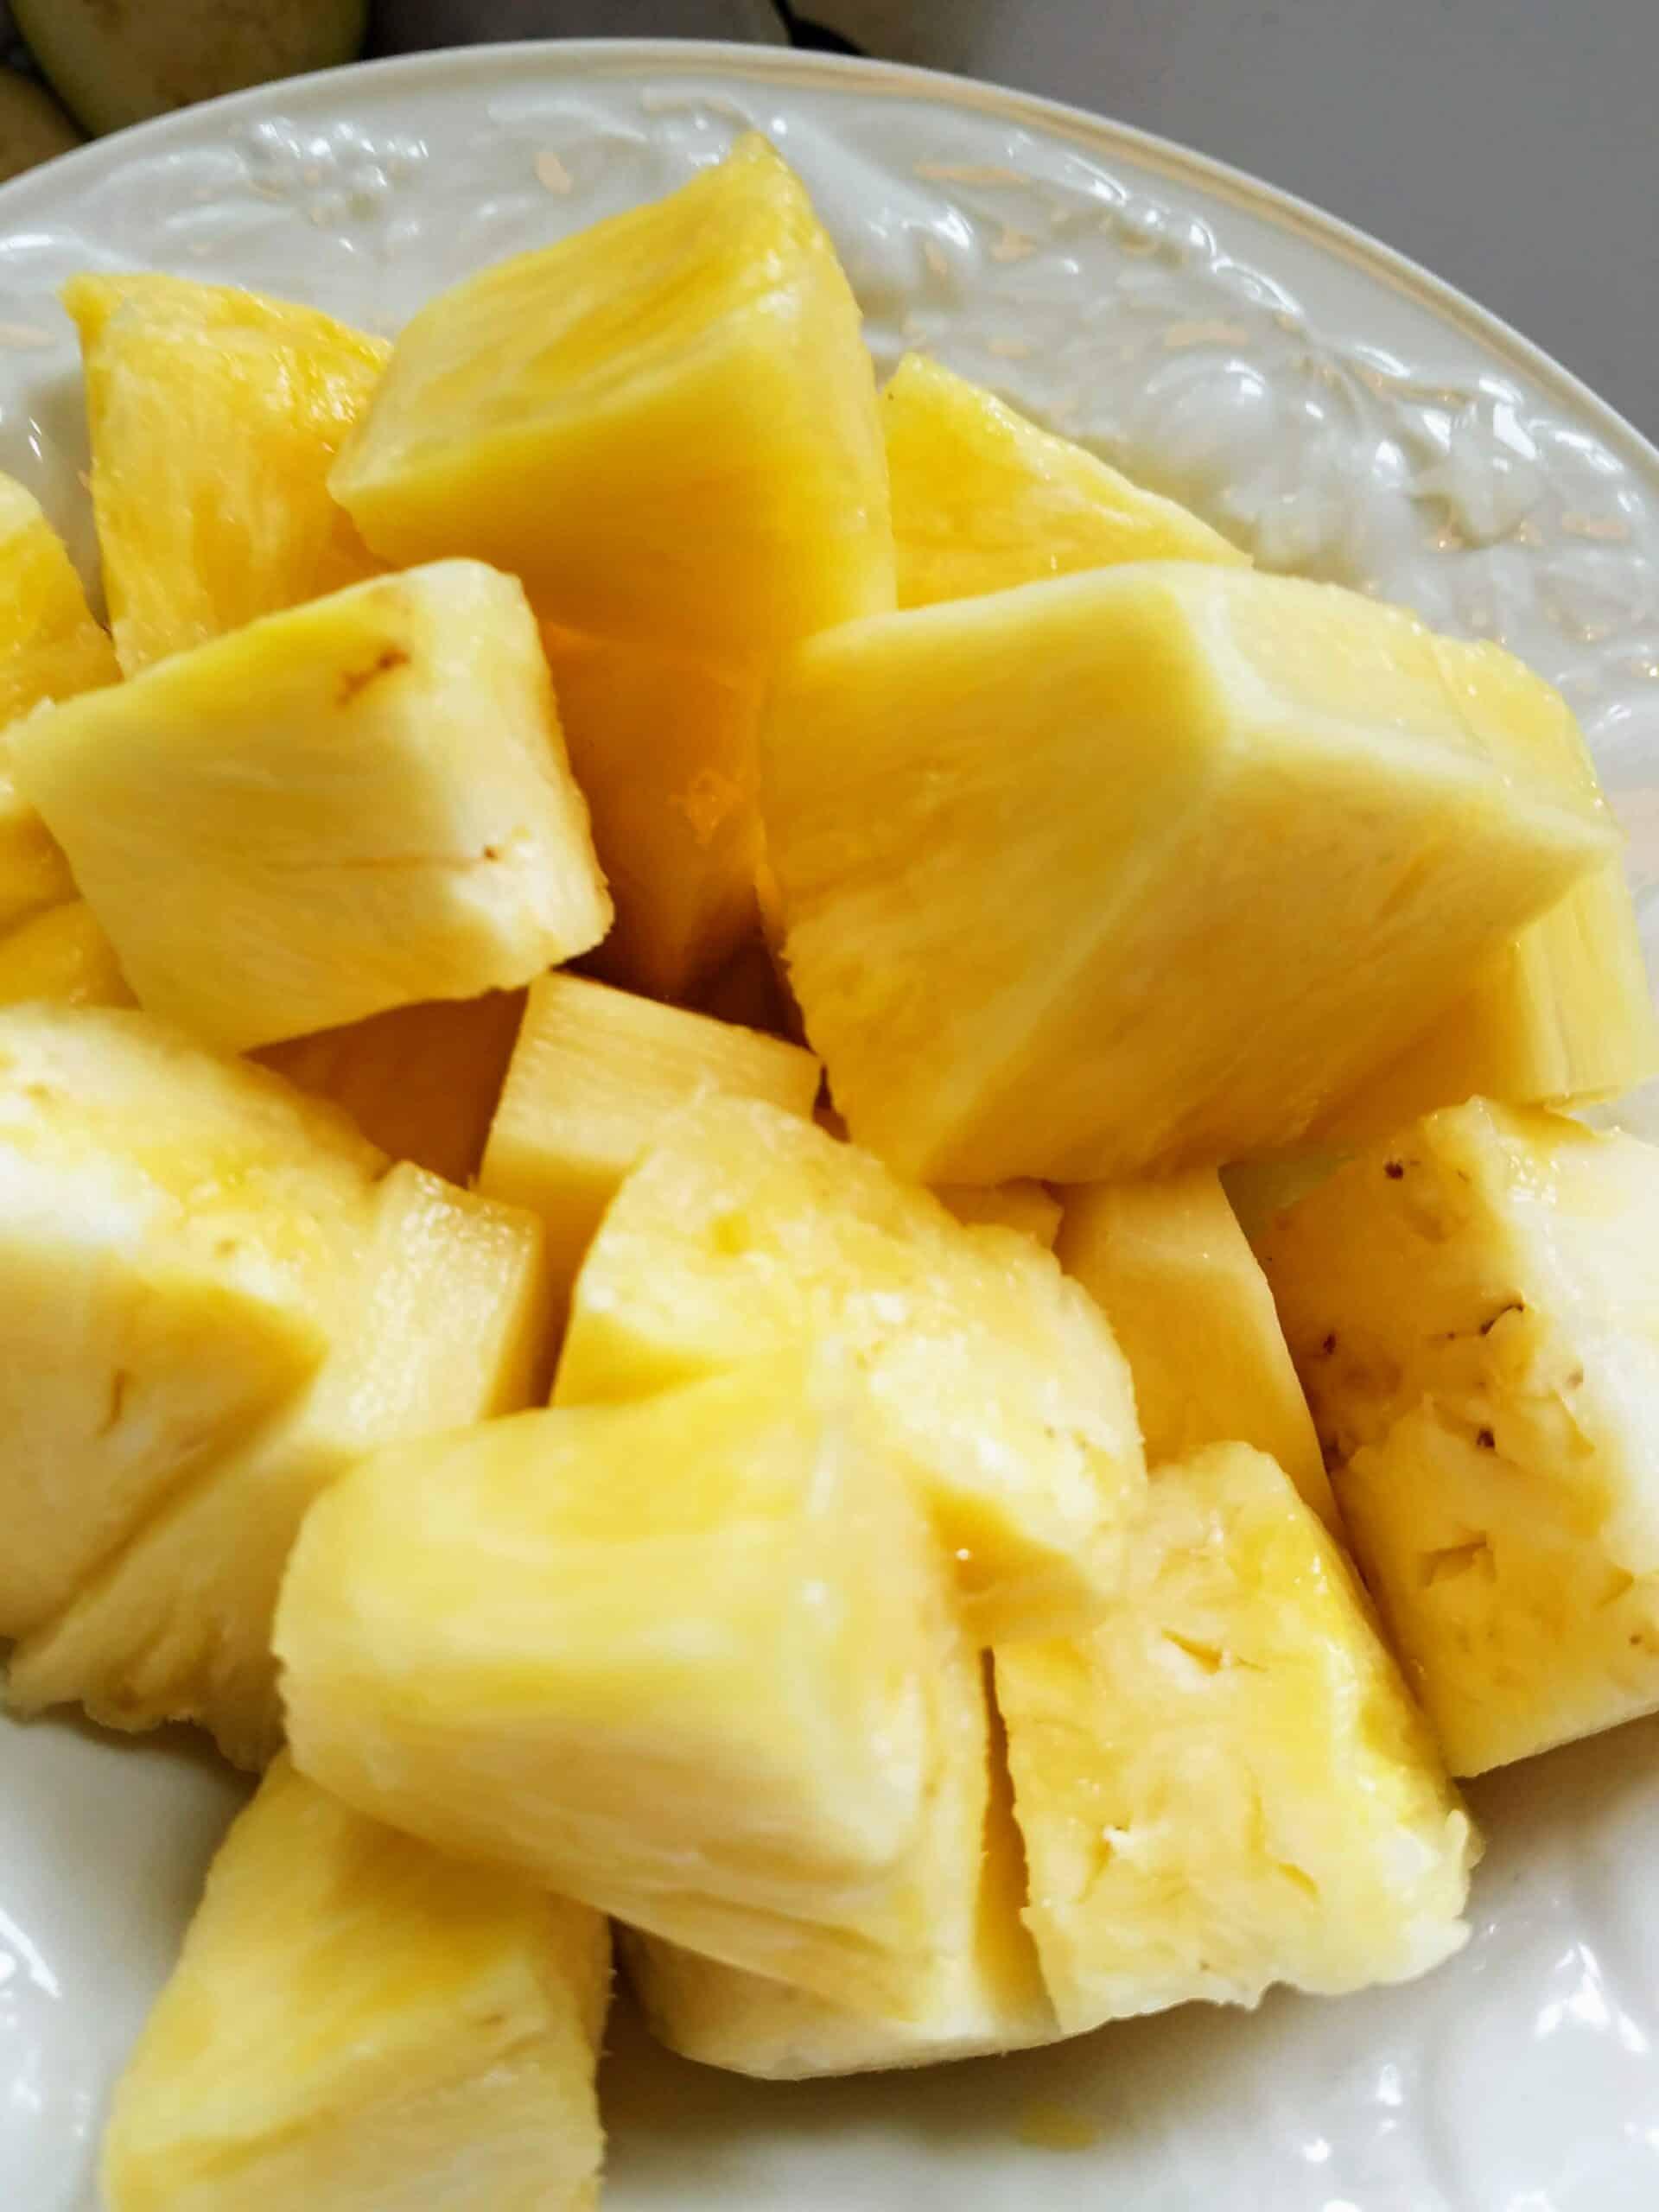 chunks freshly cut pineapple in a white bowl